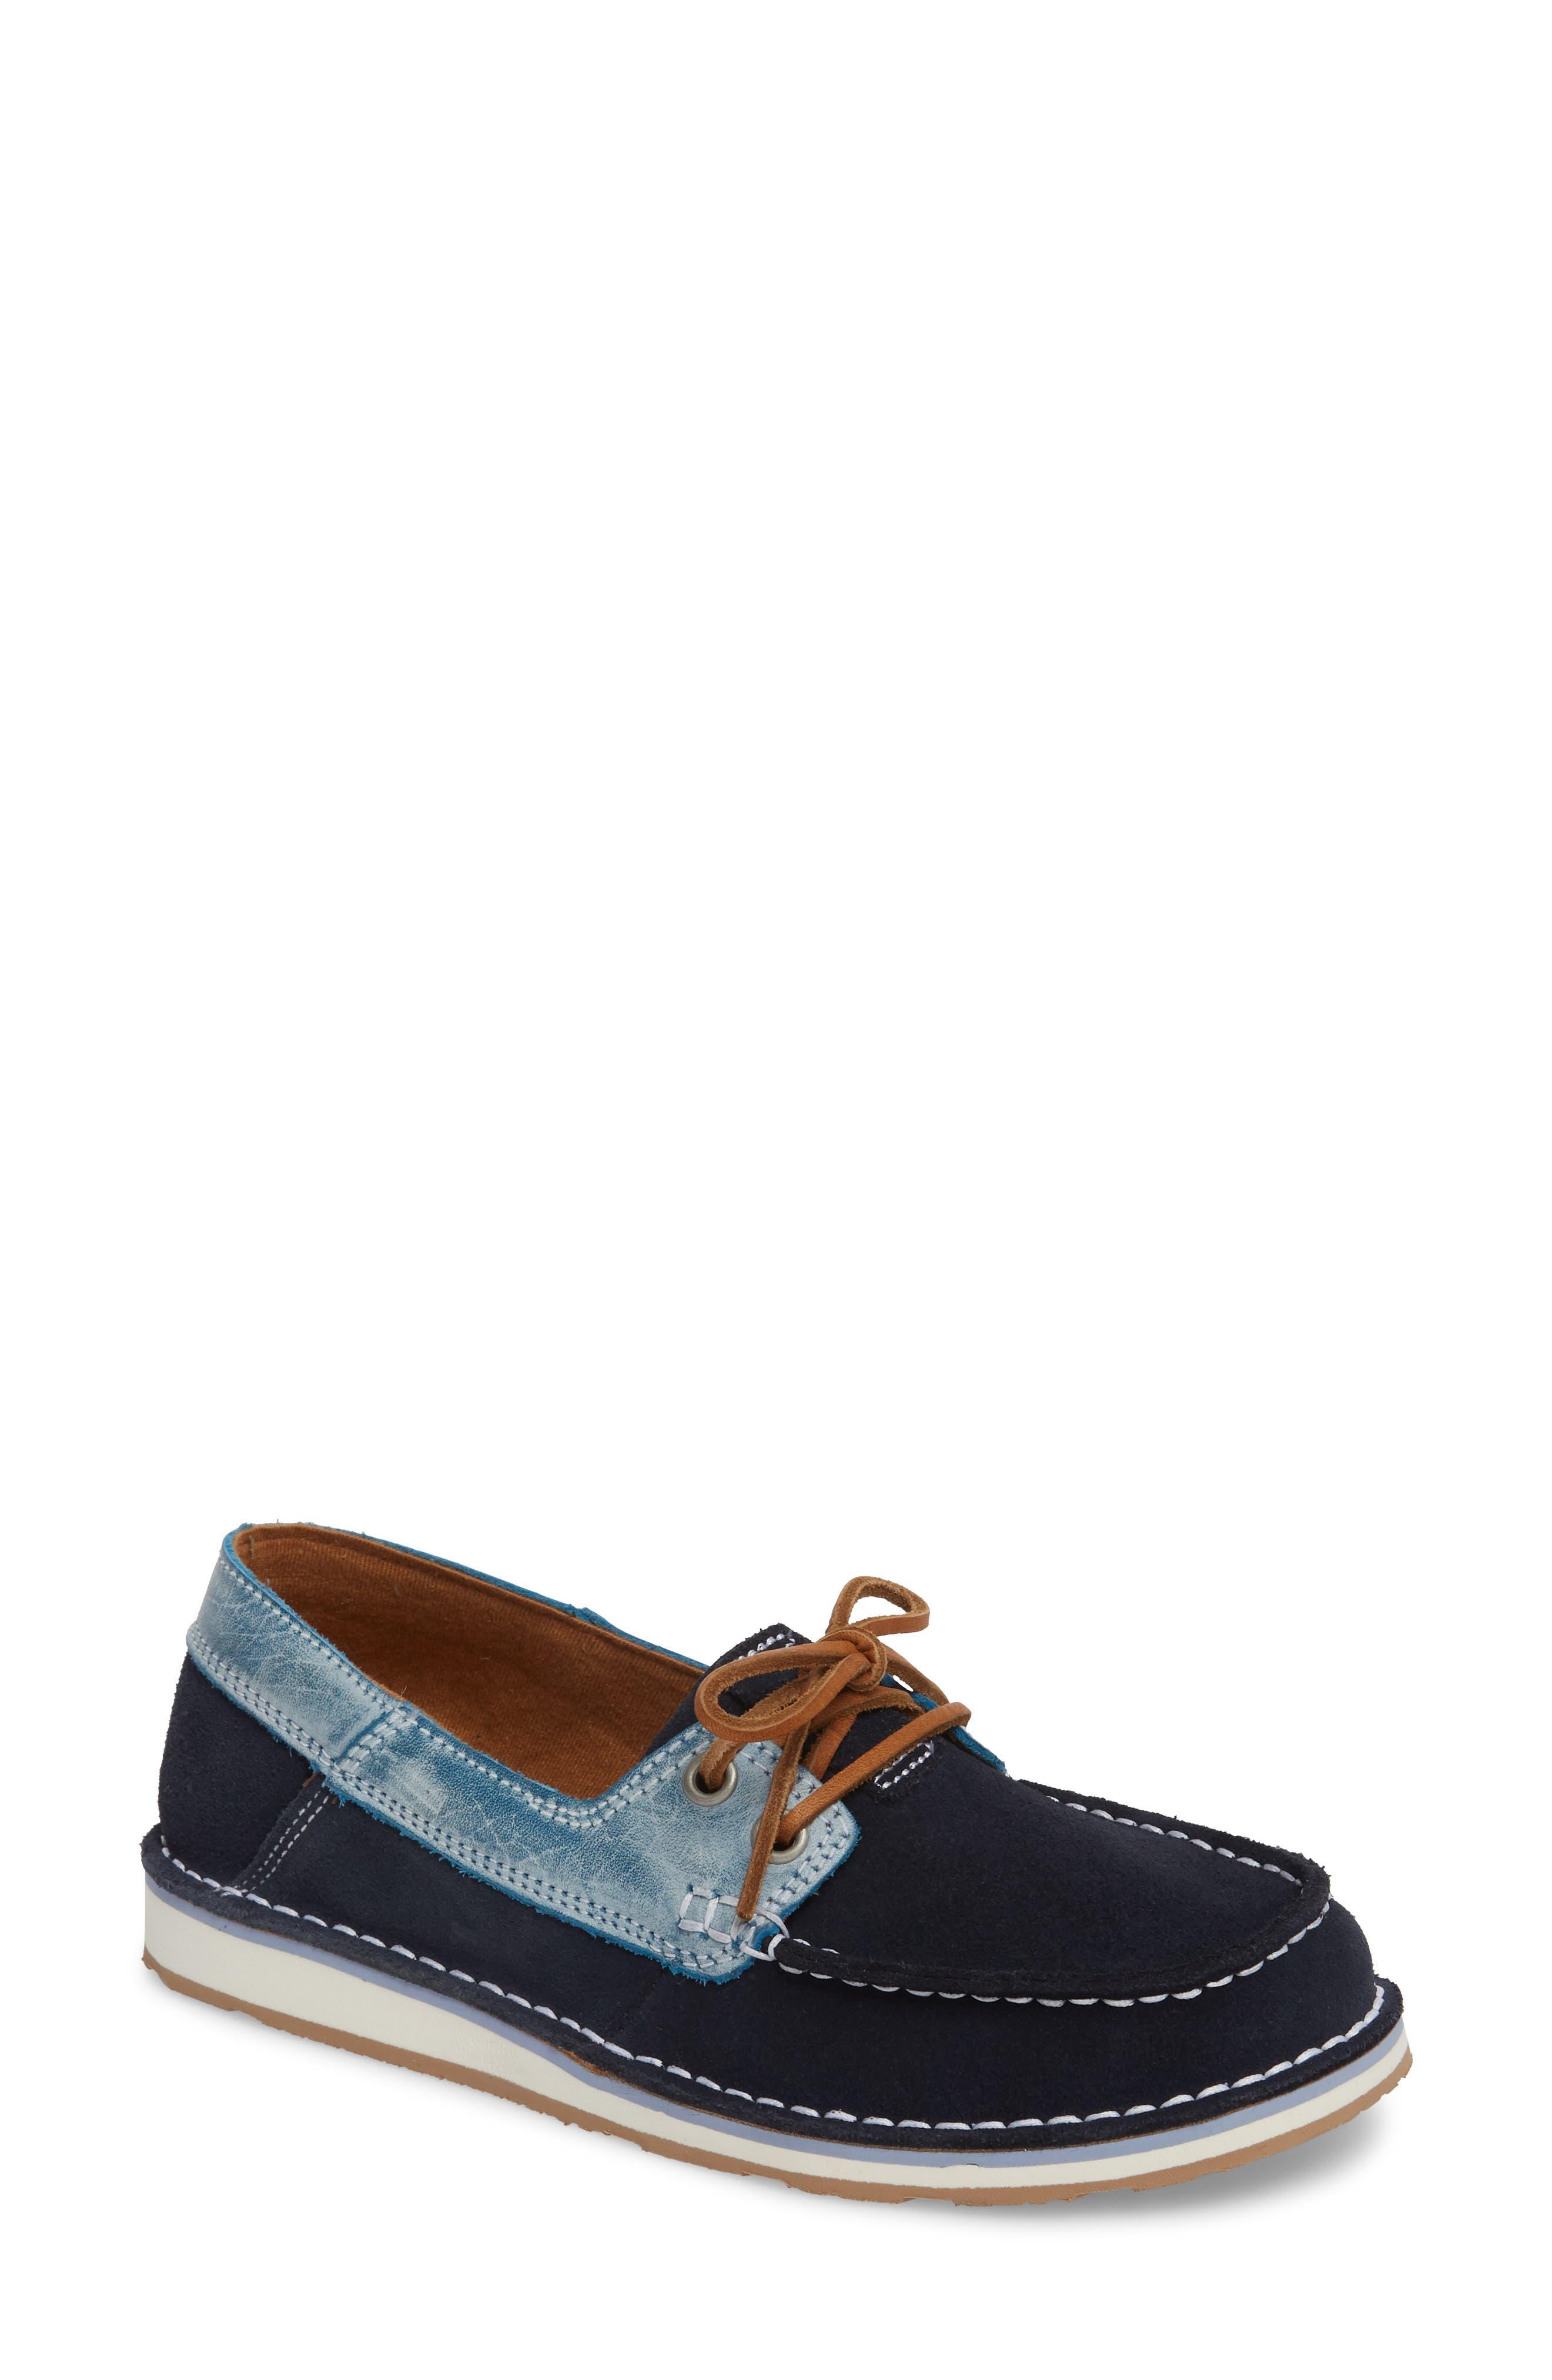 Ariat Cruiser Castaway Loafer, Blue